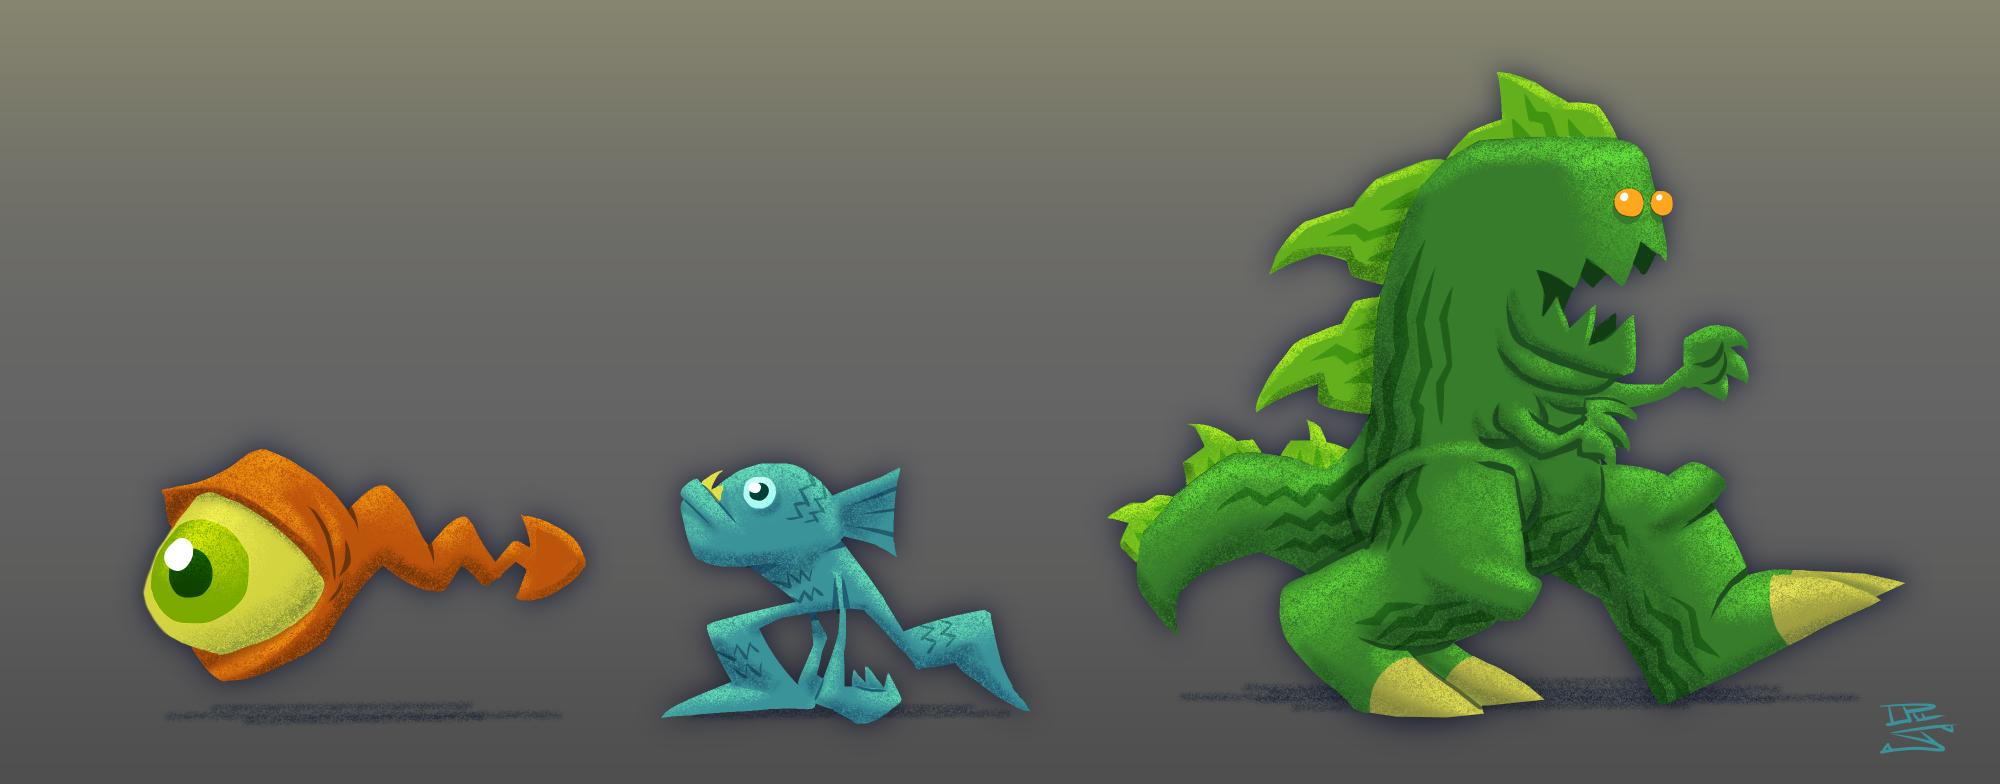 Cartoon Monster Concepts